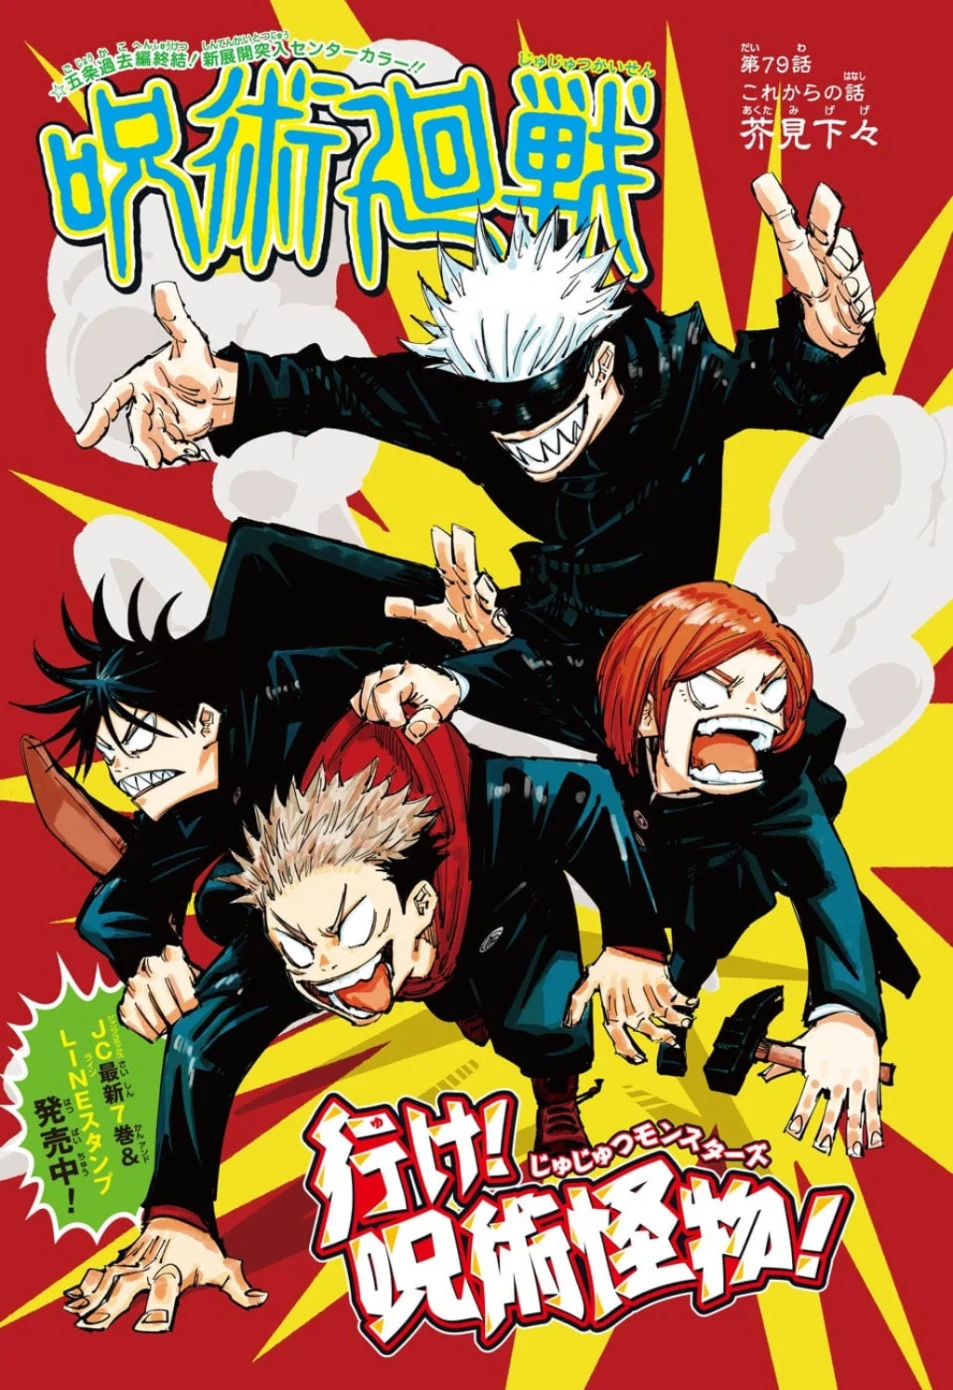 Yuji Itadori Image Gallery Jujutsu Kaisen Wiki Fandom In 2021 Manga Covers Anime Cover Photo Anime Printables